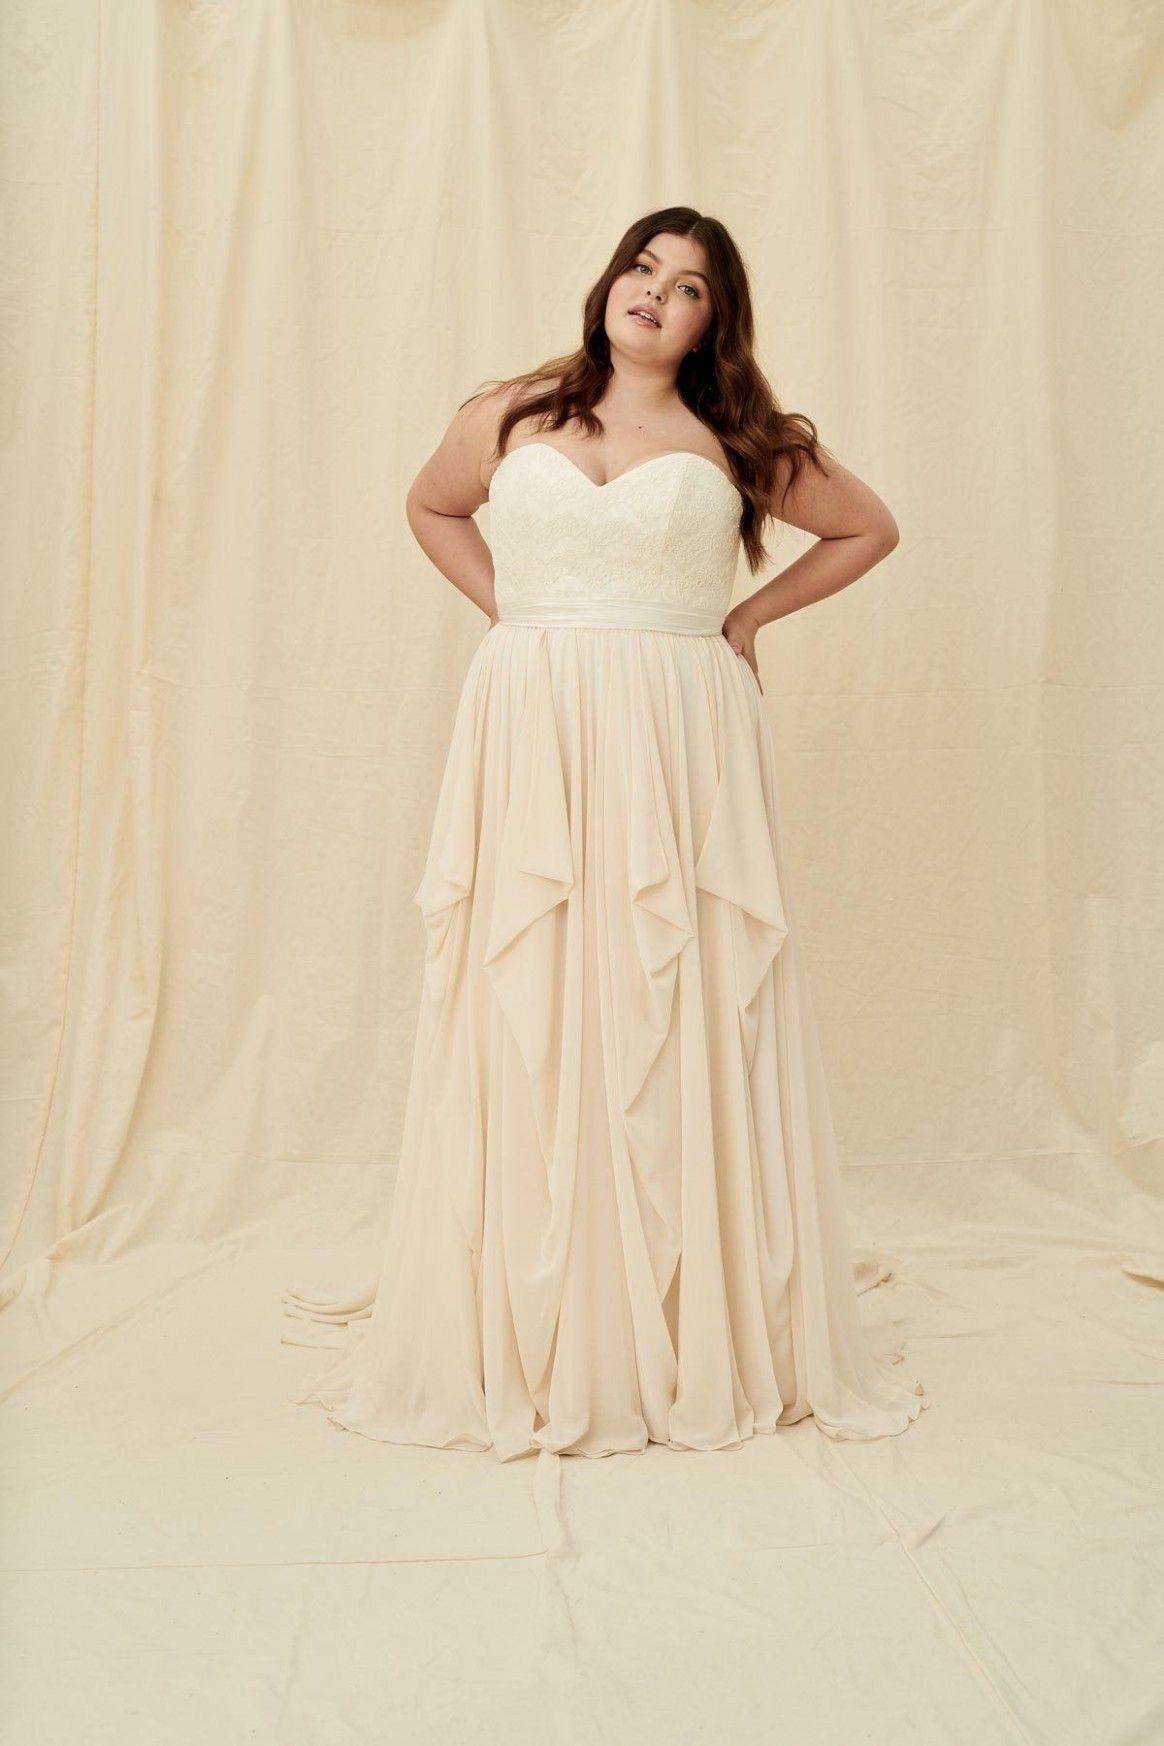 Plus Size Wedding Dress Calgary [ 1746 x 1164 Pixel ]